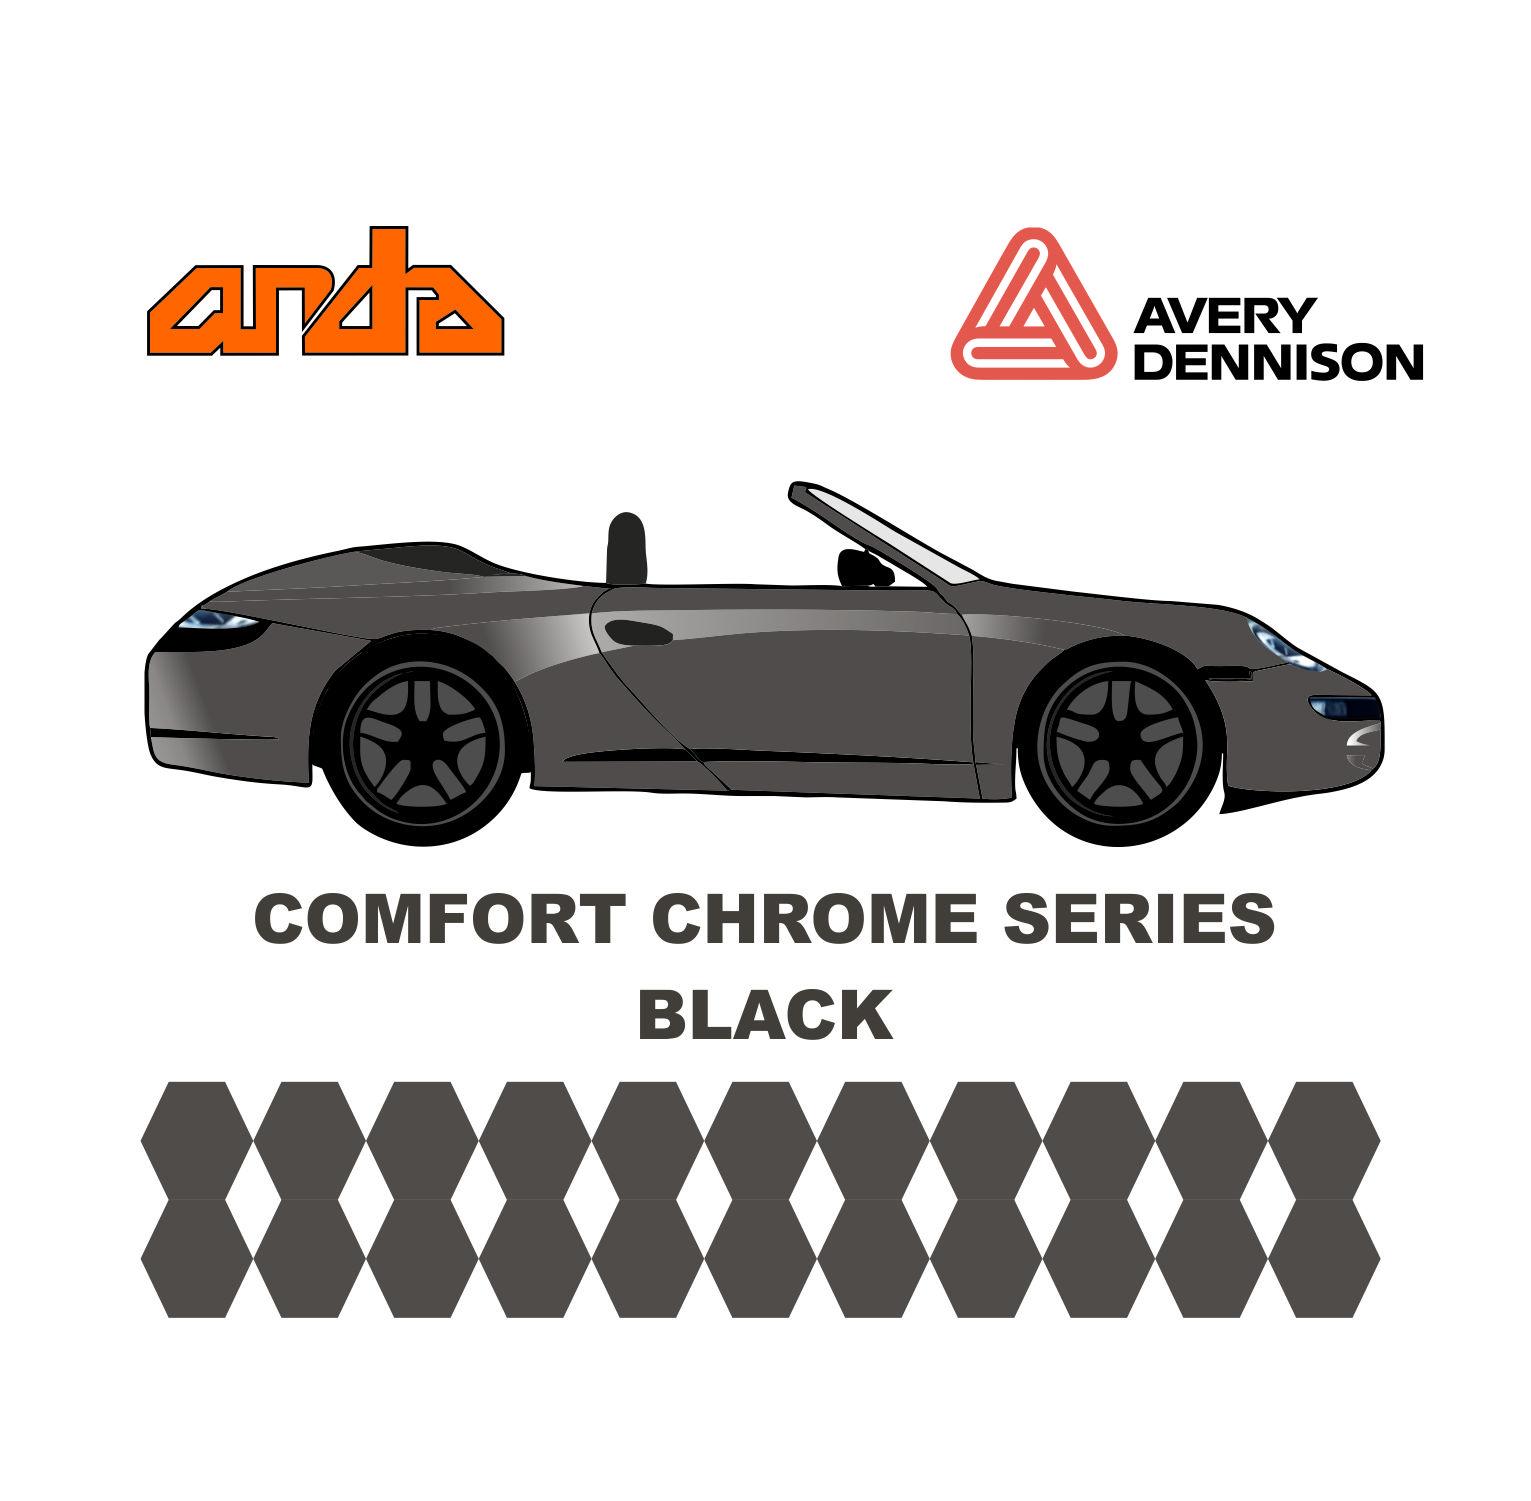 Avery Dennison- SWF Comform Chrome Black 1